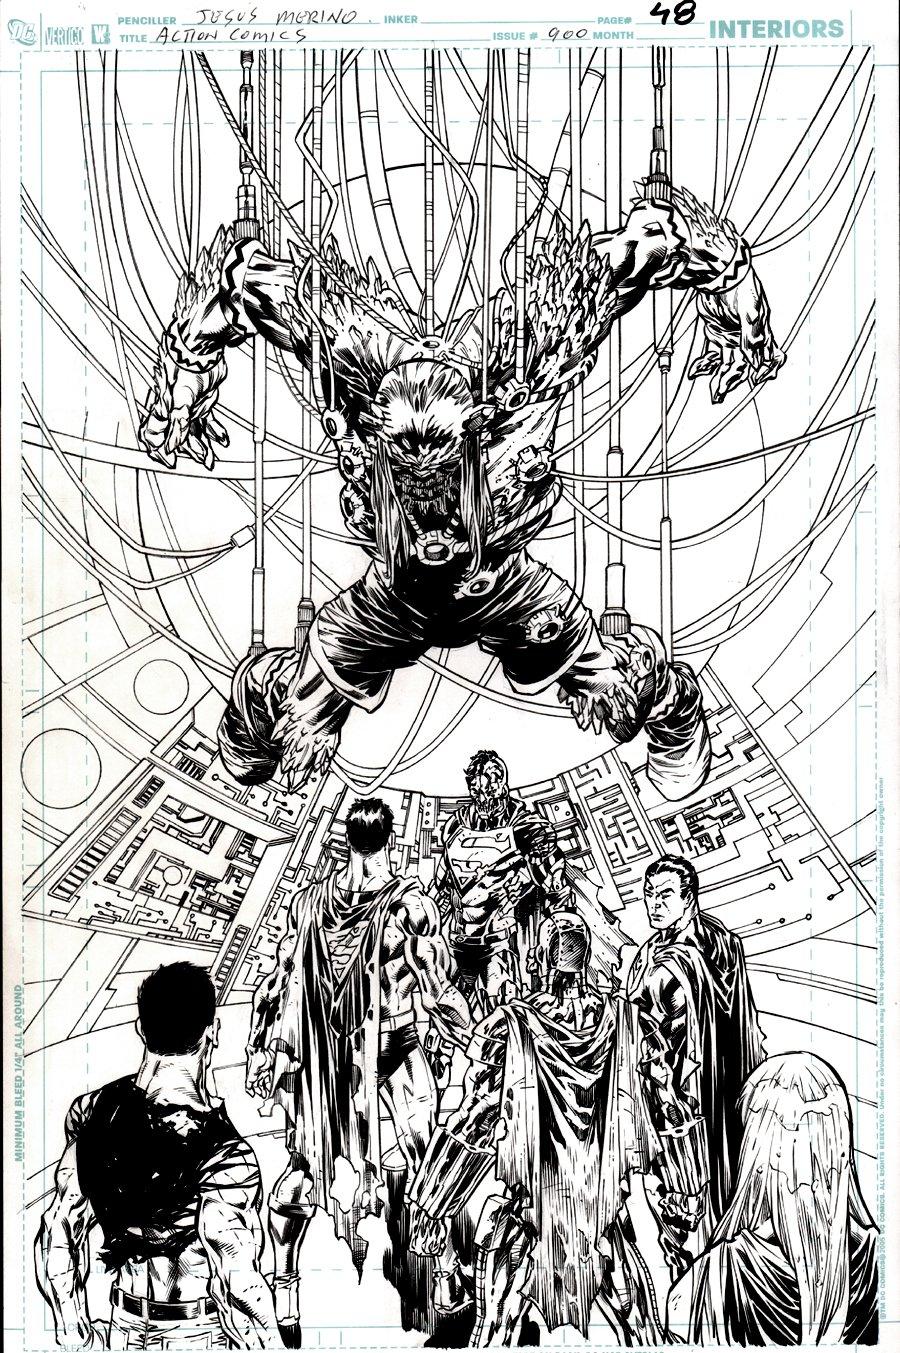 Action Comics #900 p 48 SPLASH (DOOMSDAY & 4 SUPERMEN!) 2011